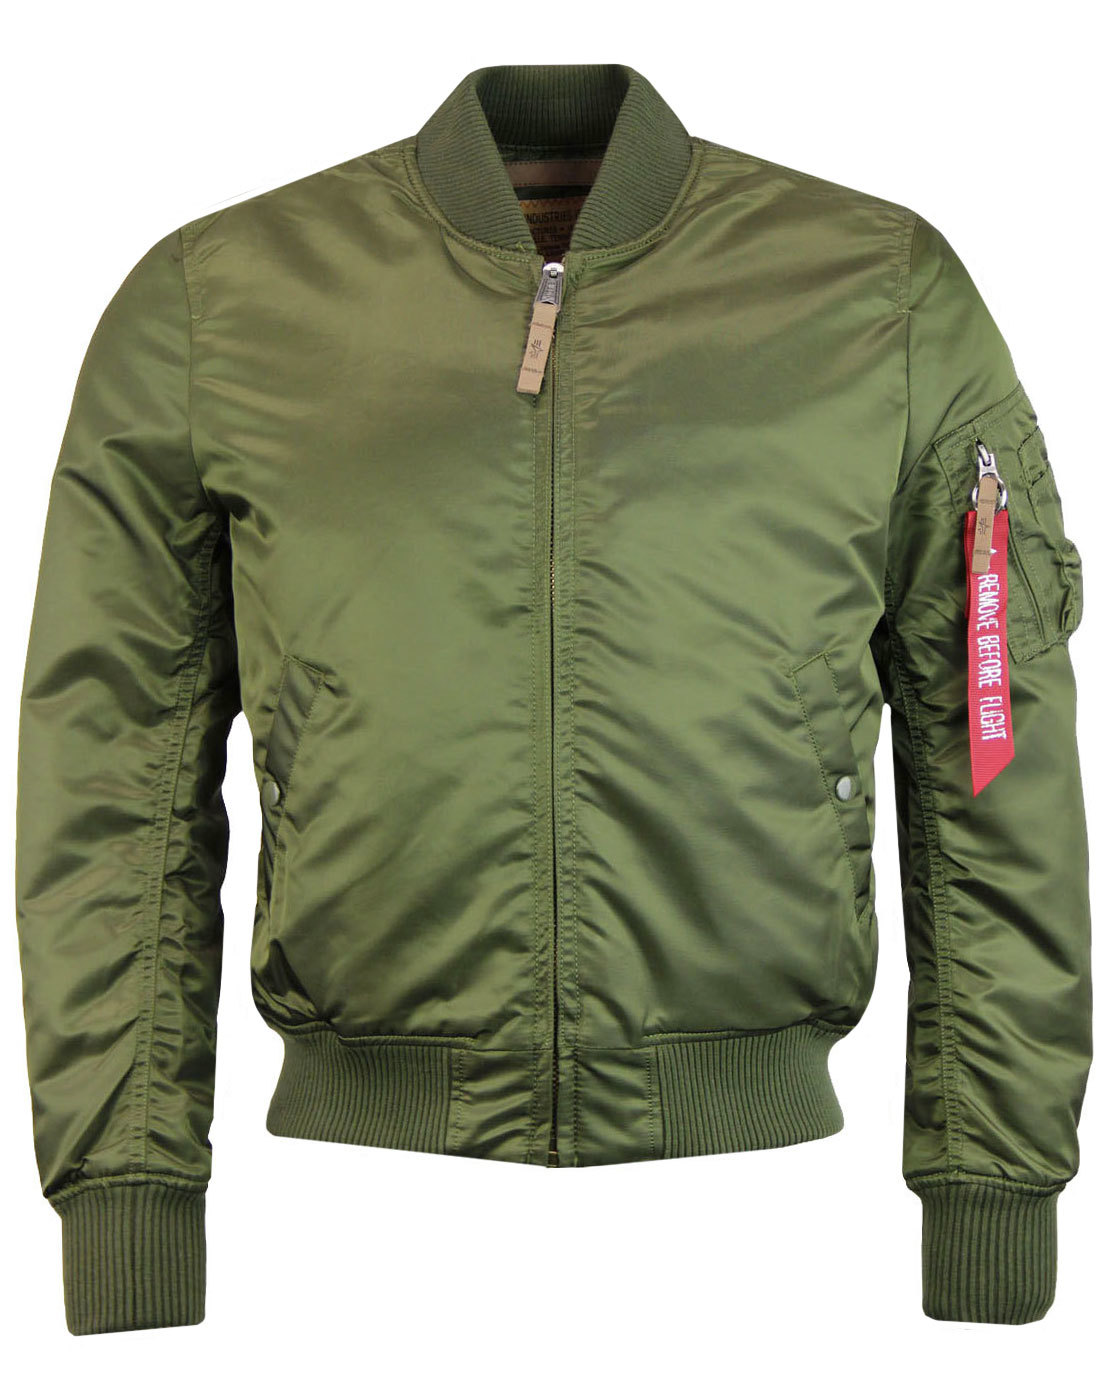 MA1 VF ALPHA INDUSTRIES Mod Bomber Jacket GREEN